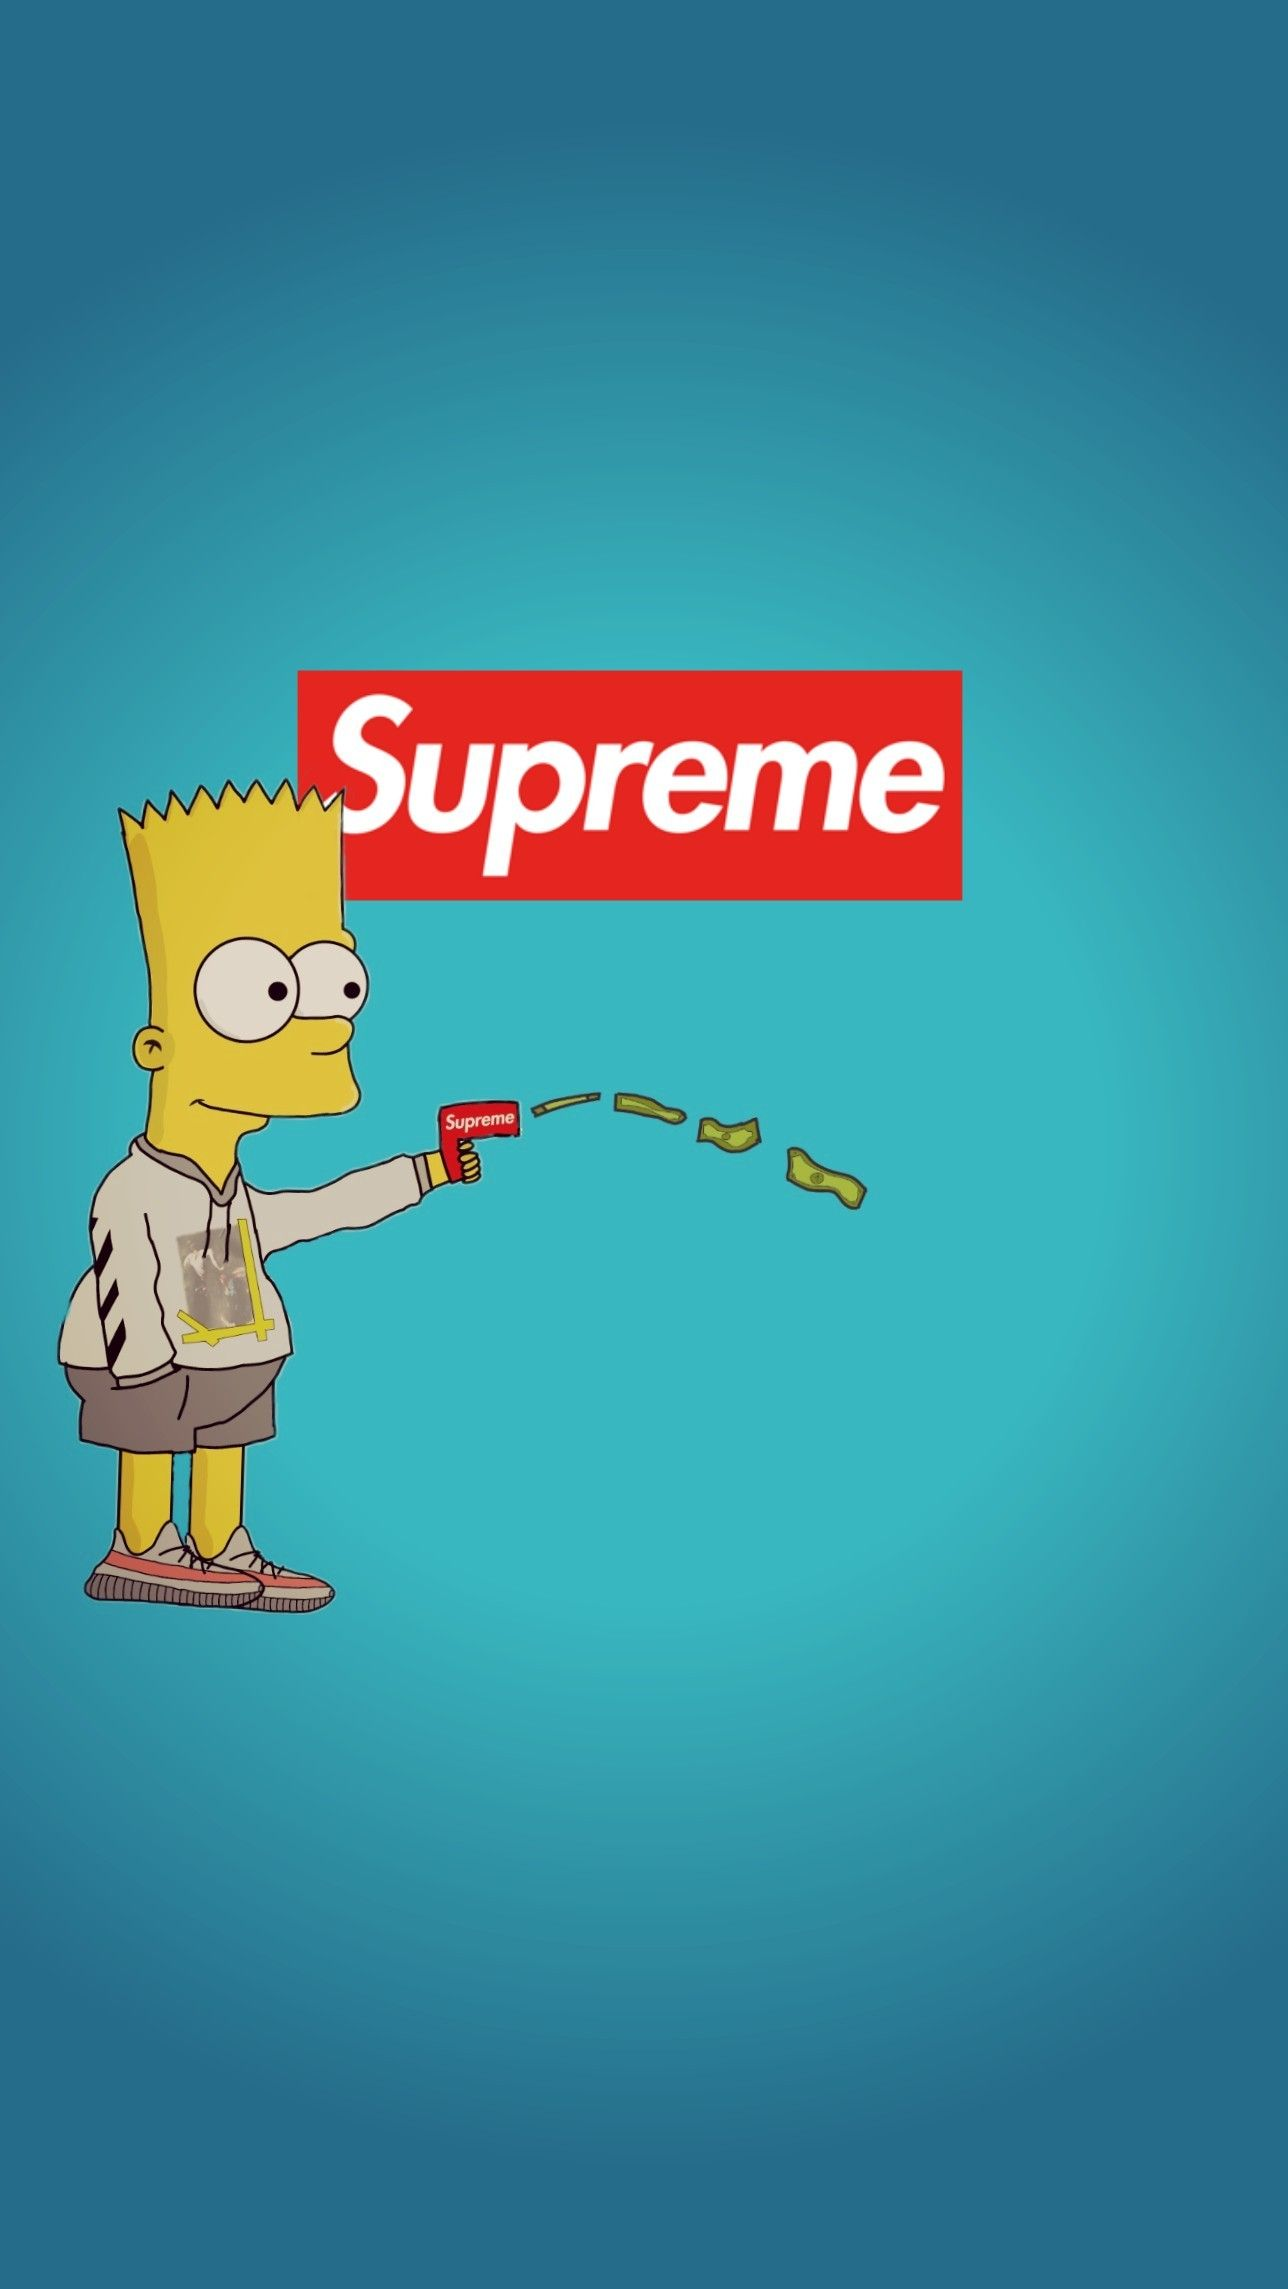 13+ The Simpsons Supreme Wallpapers on WallpaperSafari